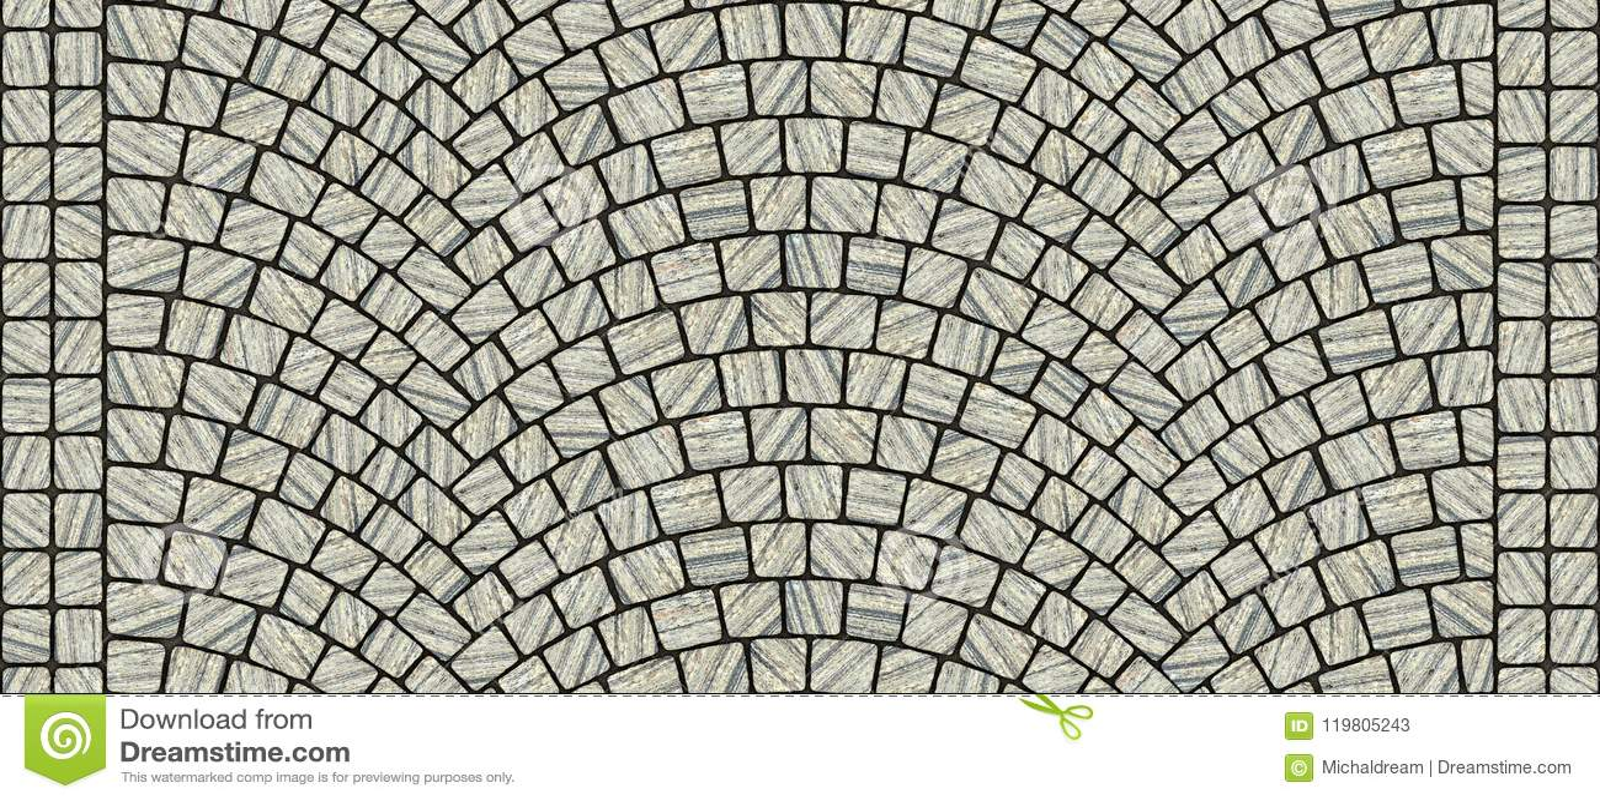 Road curved cobblestone texture 029